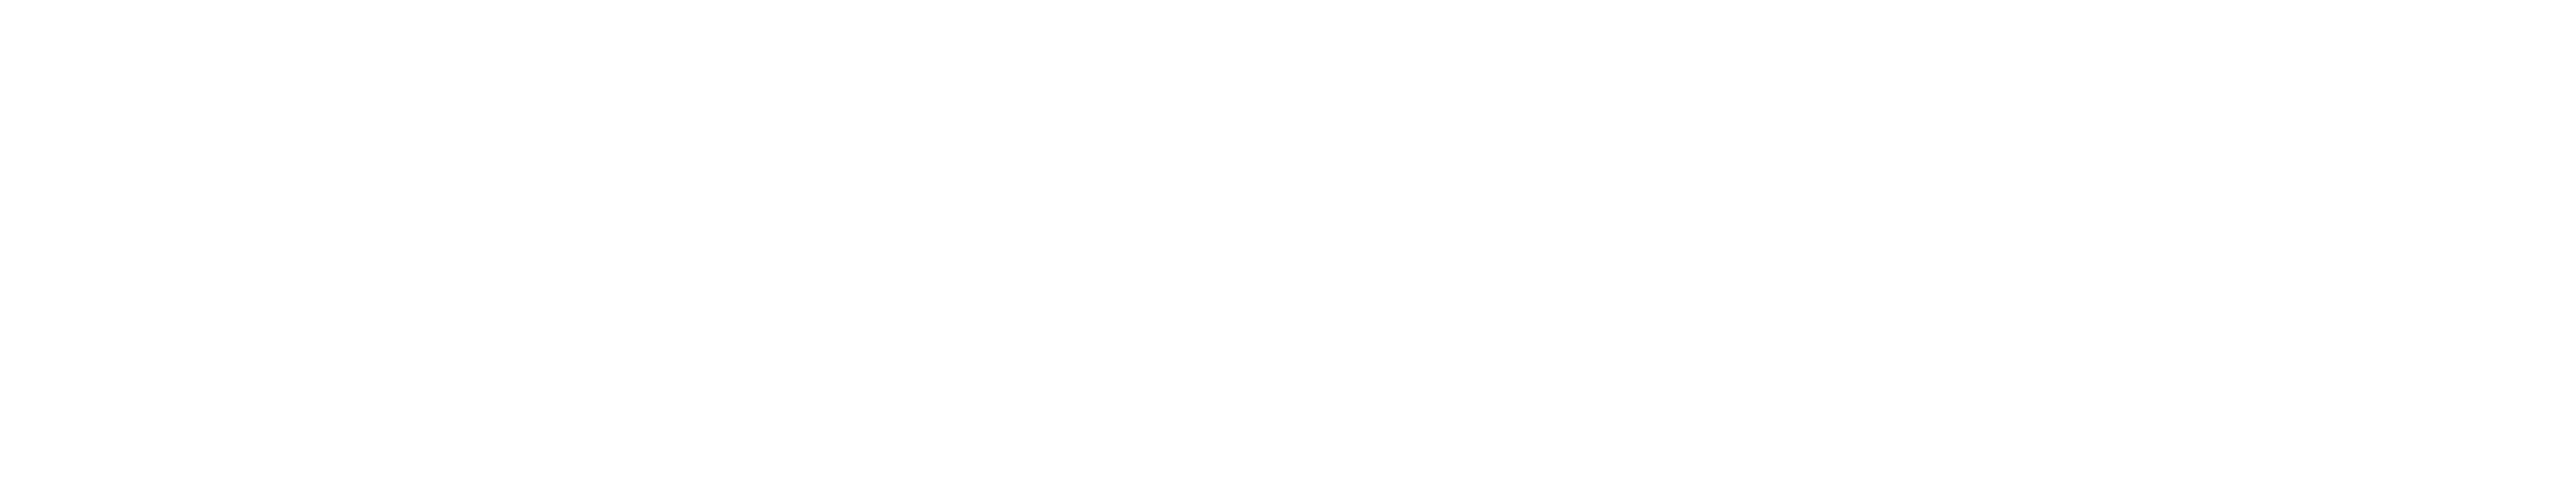 N1 Plastic Surgery